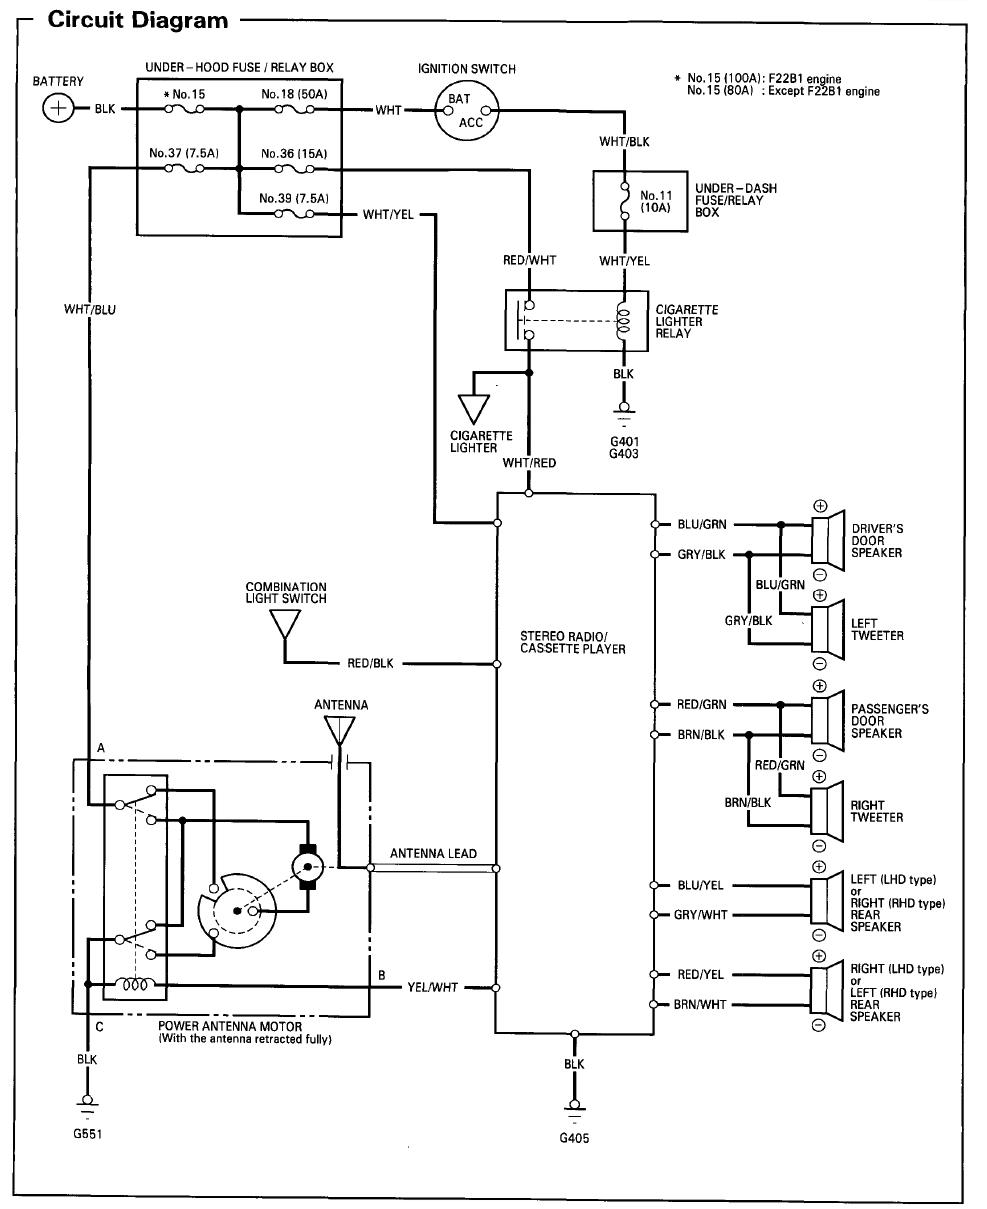 2002 Honda Accord Wiring Diagram Stereo